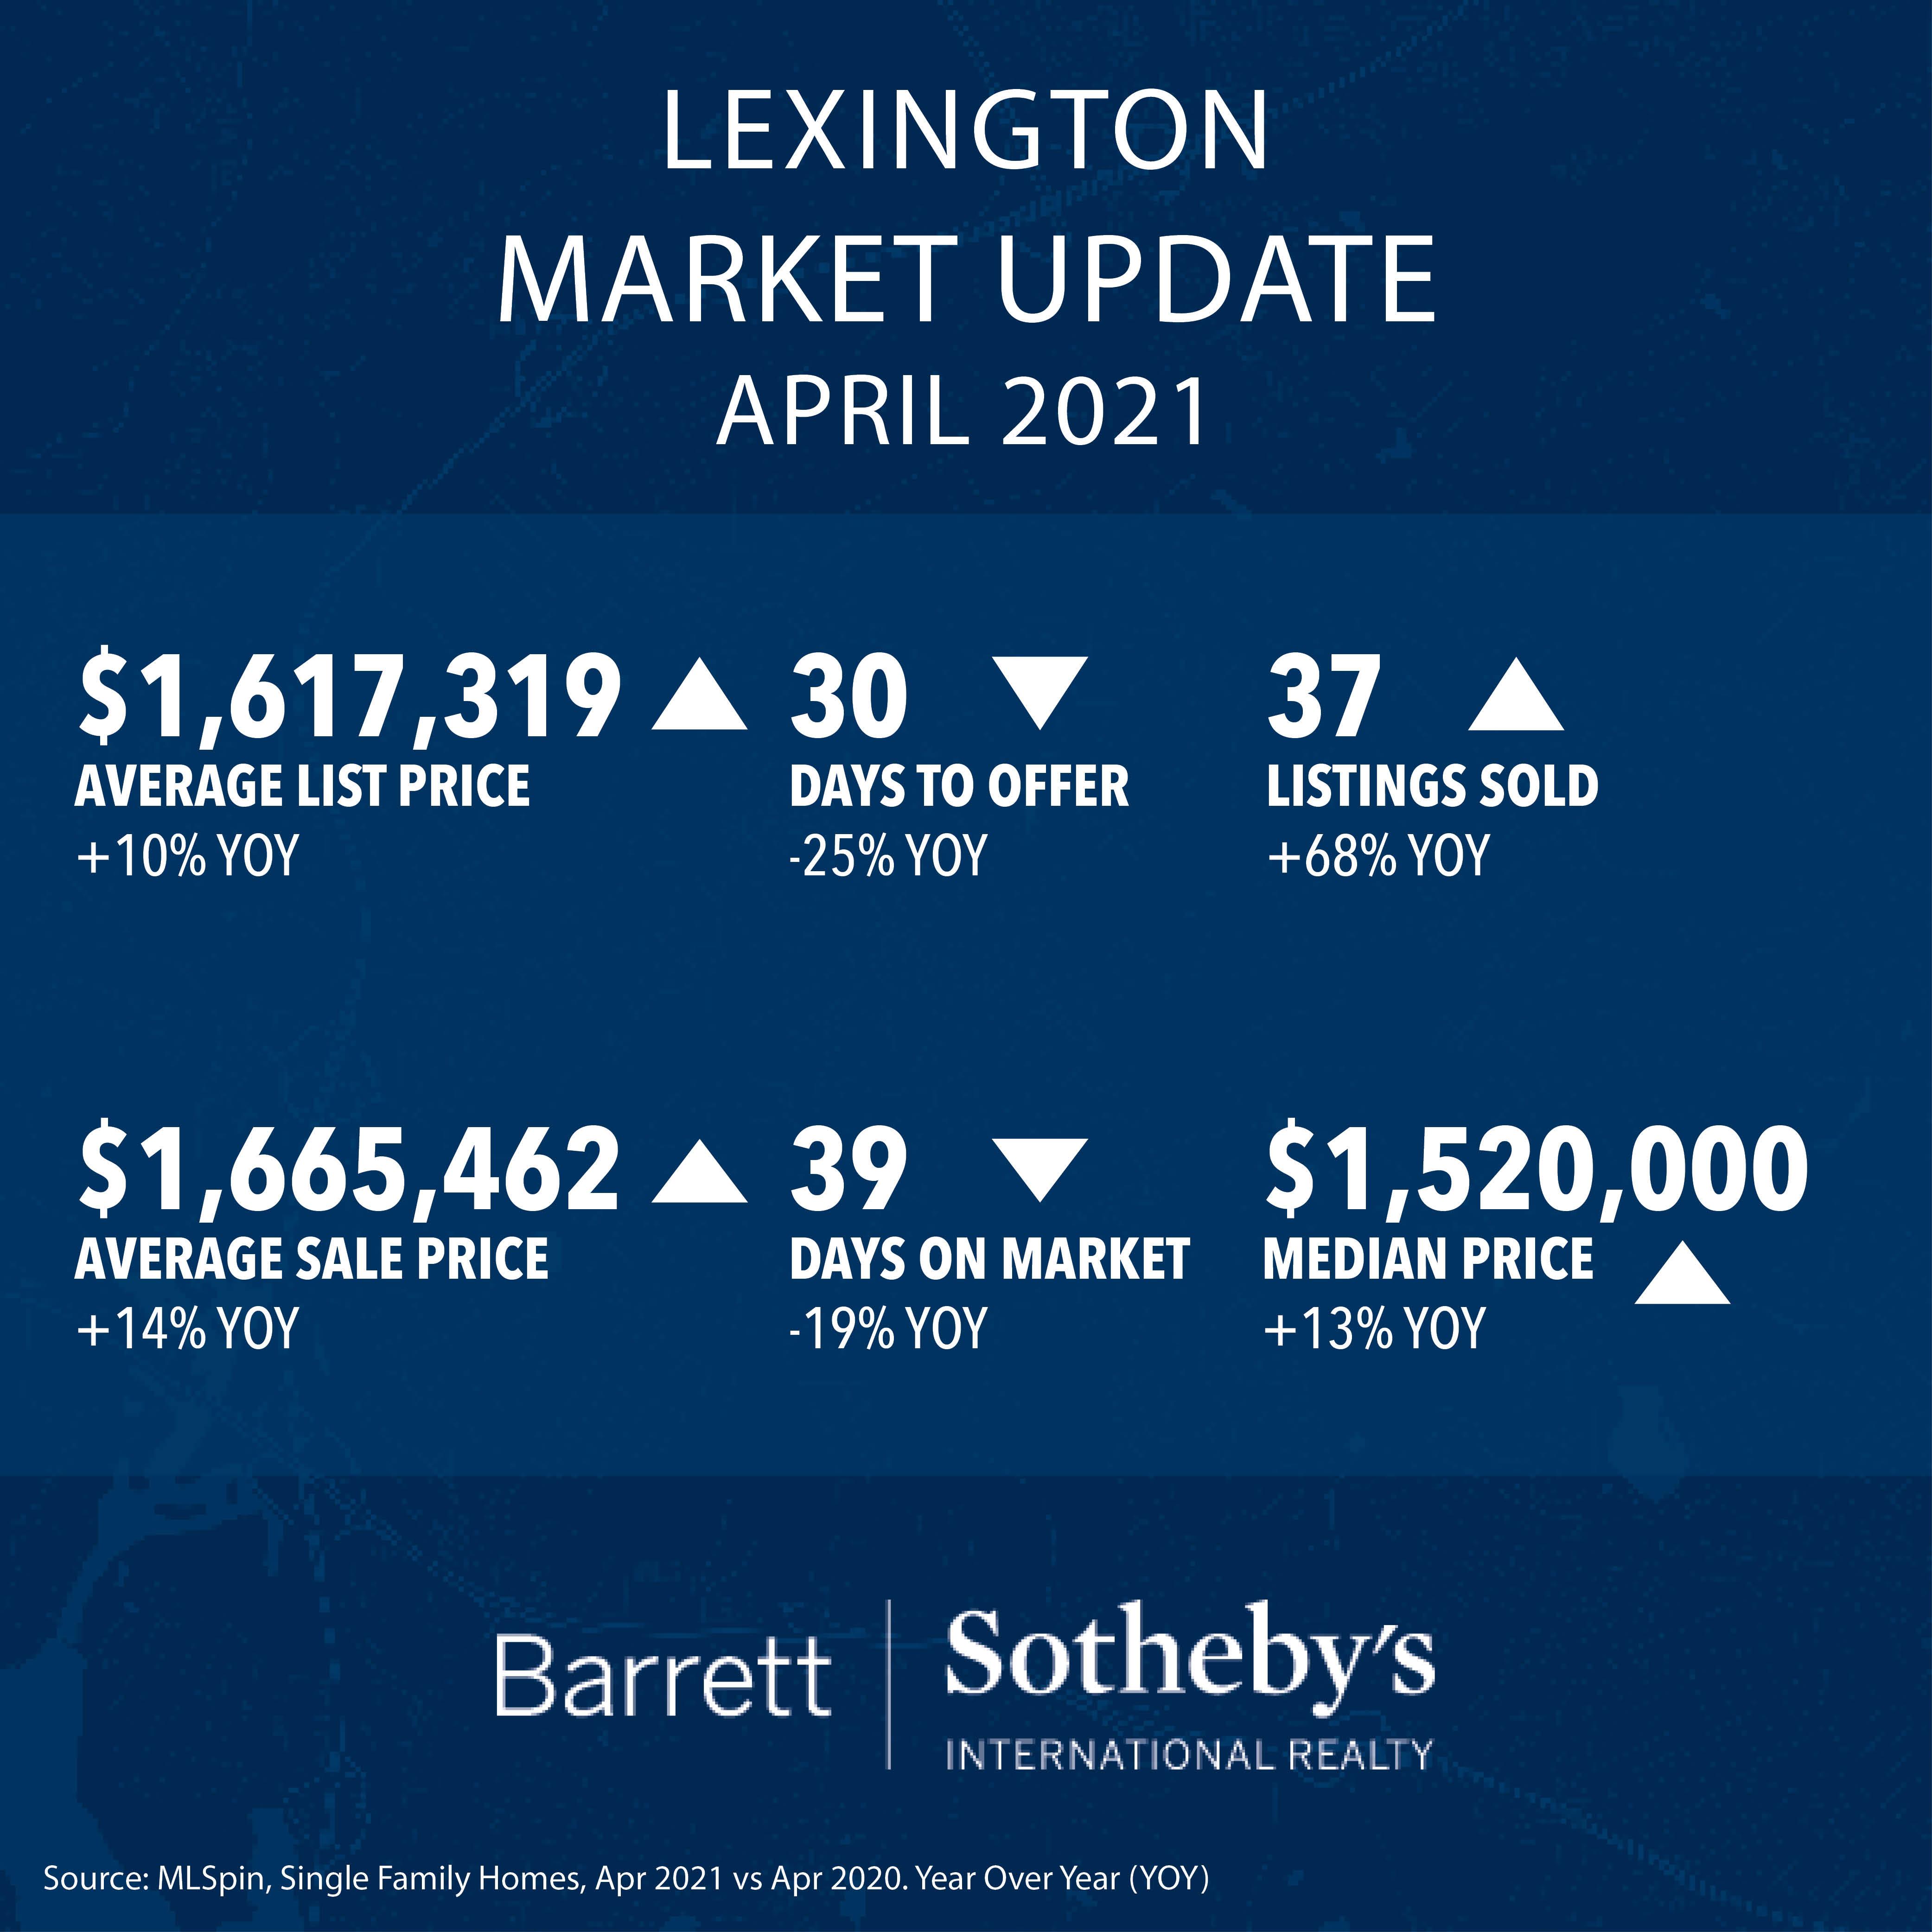 Lexington Real Estate Market Update